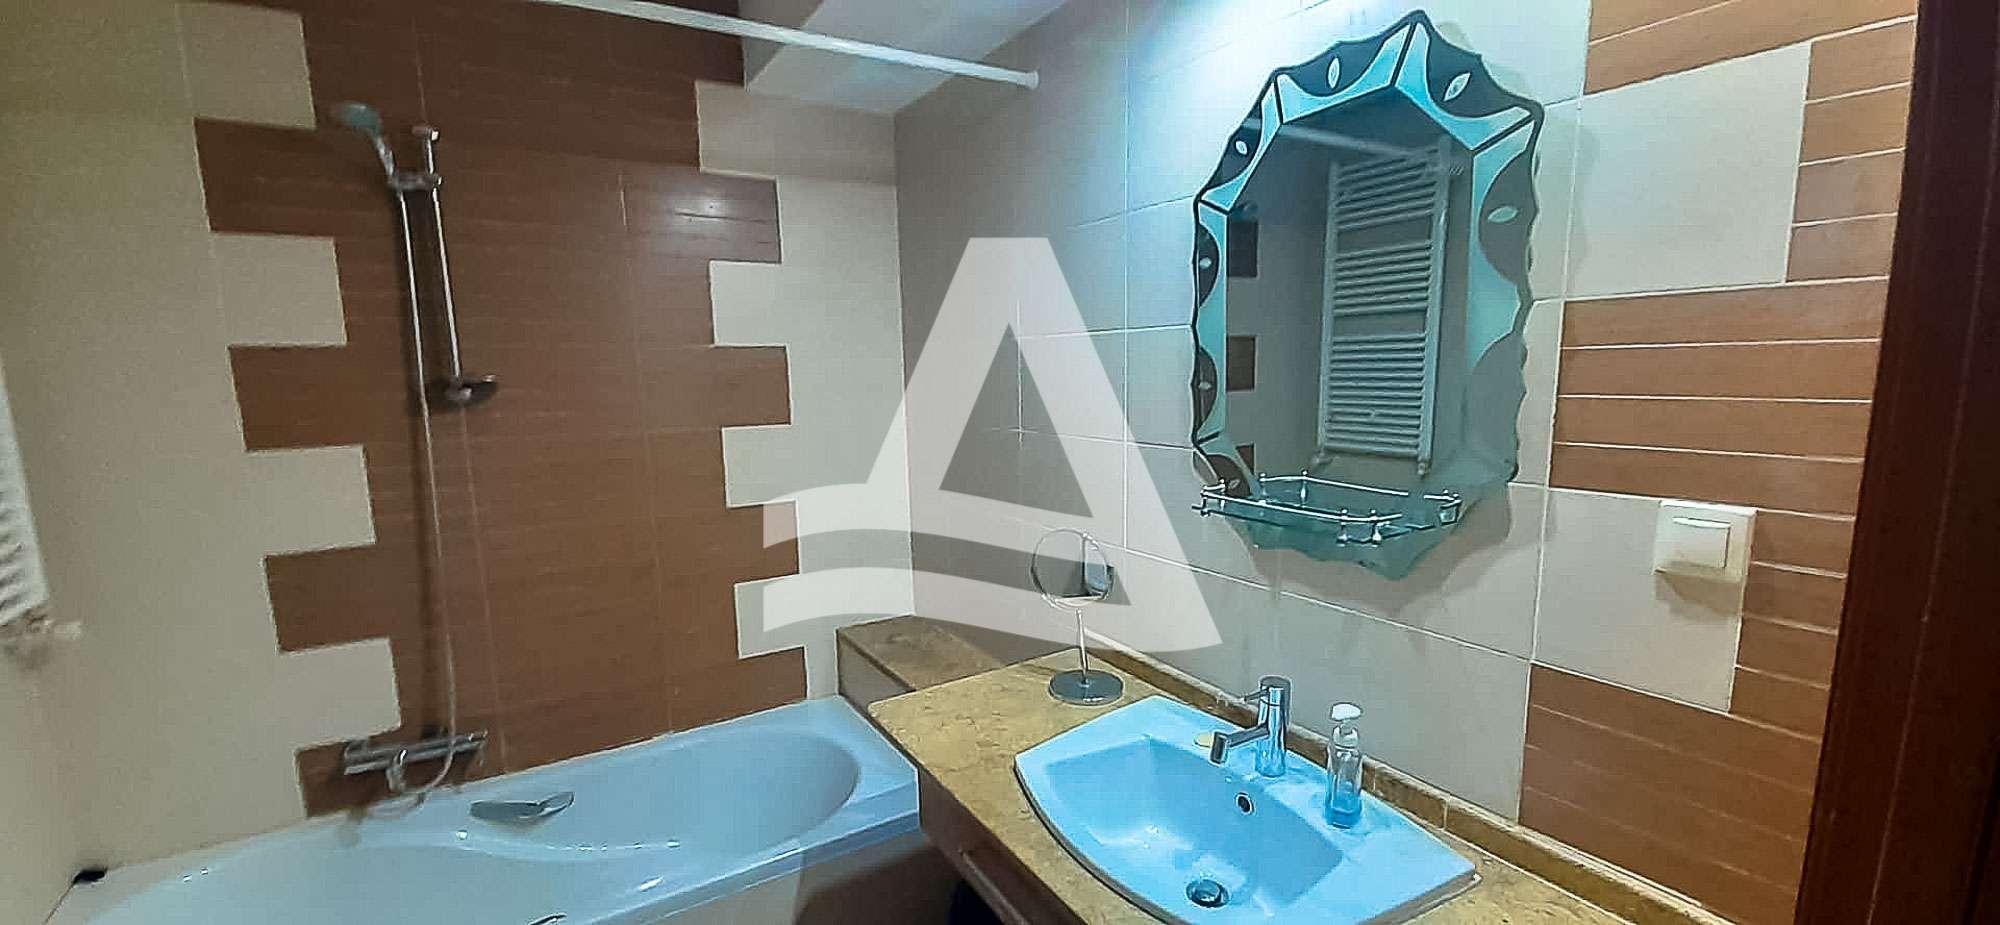 httpss3.amazonaws.comlogimoaws_Arcane_immobilière_la_Marsa-_location_-_vente_la_marsa_3_sur_12_1574867274135